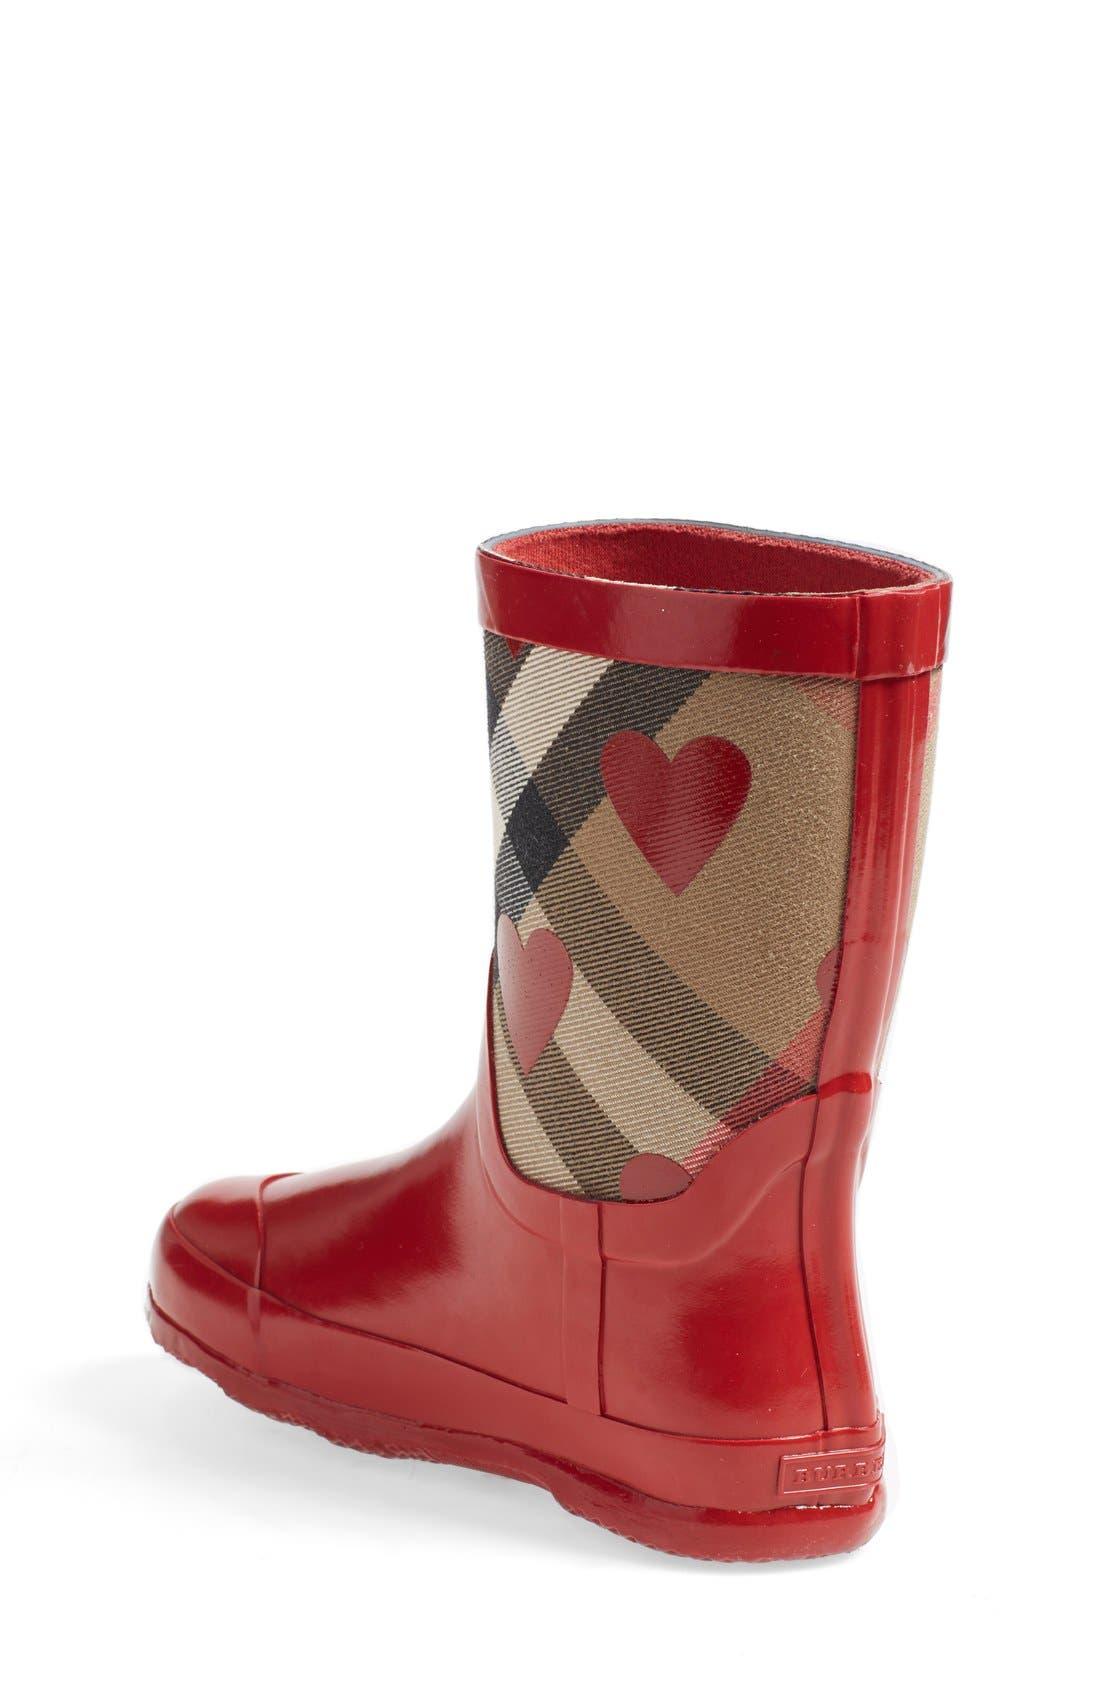 'Ranmoor' Heart Print Rain Boot,                             Alternate thumbnail 2, color,                             608